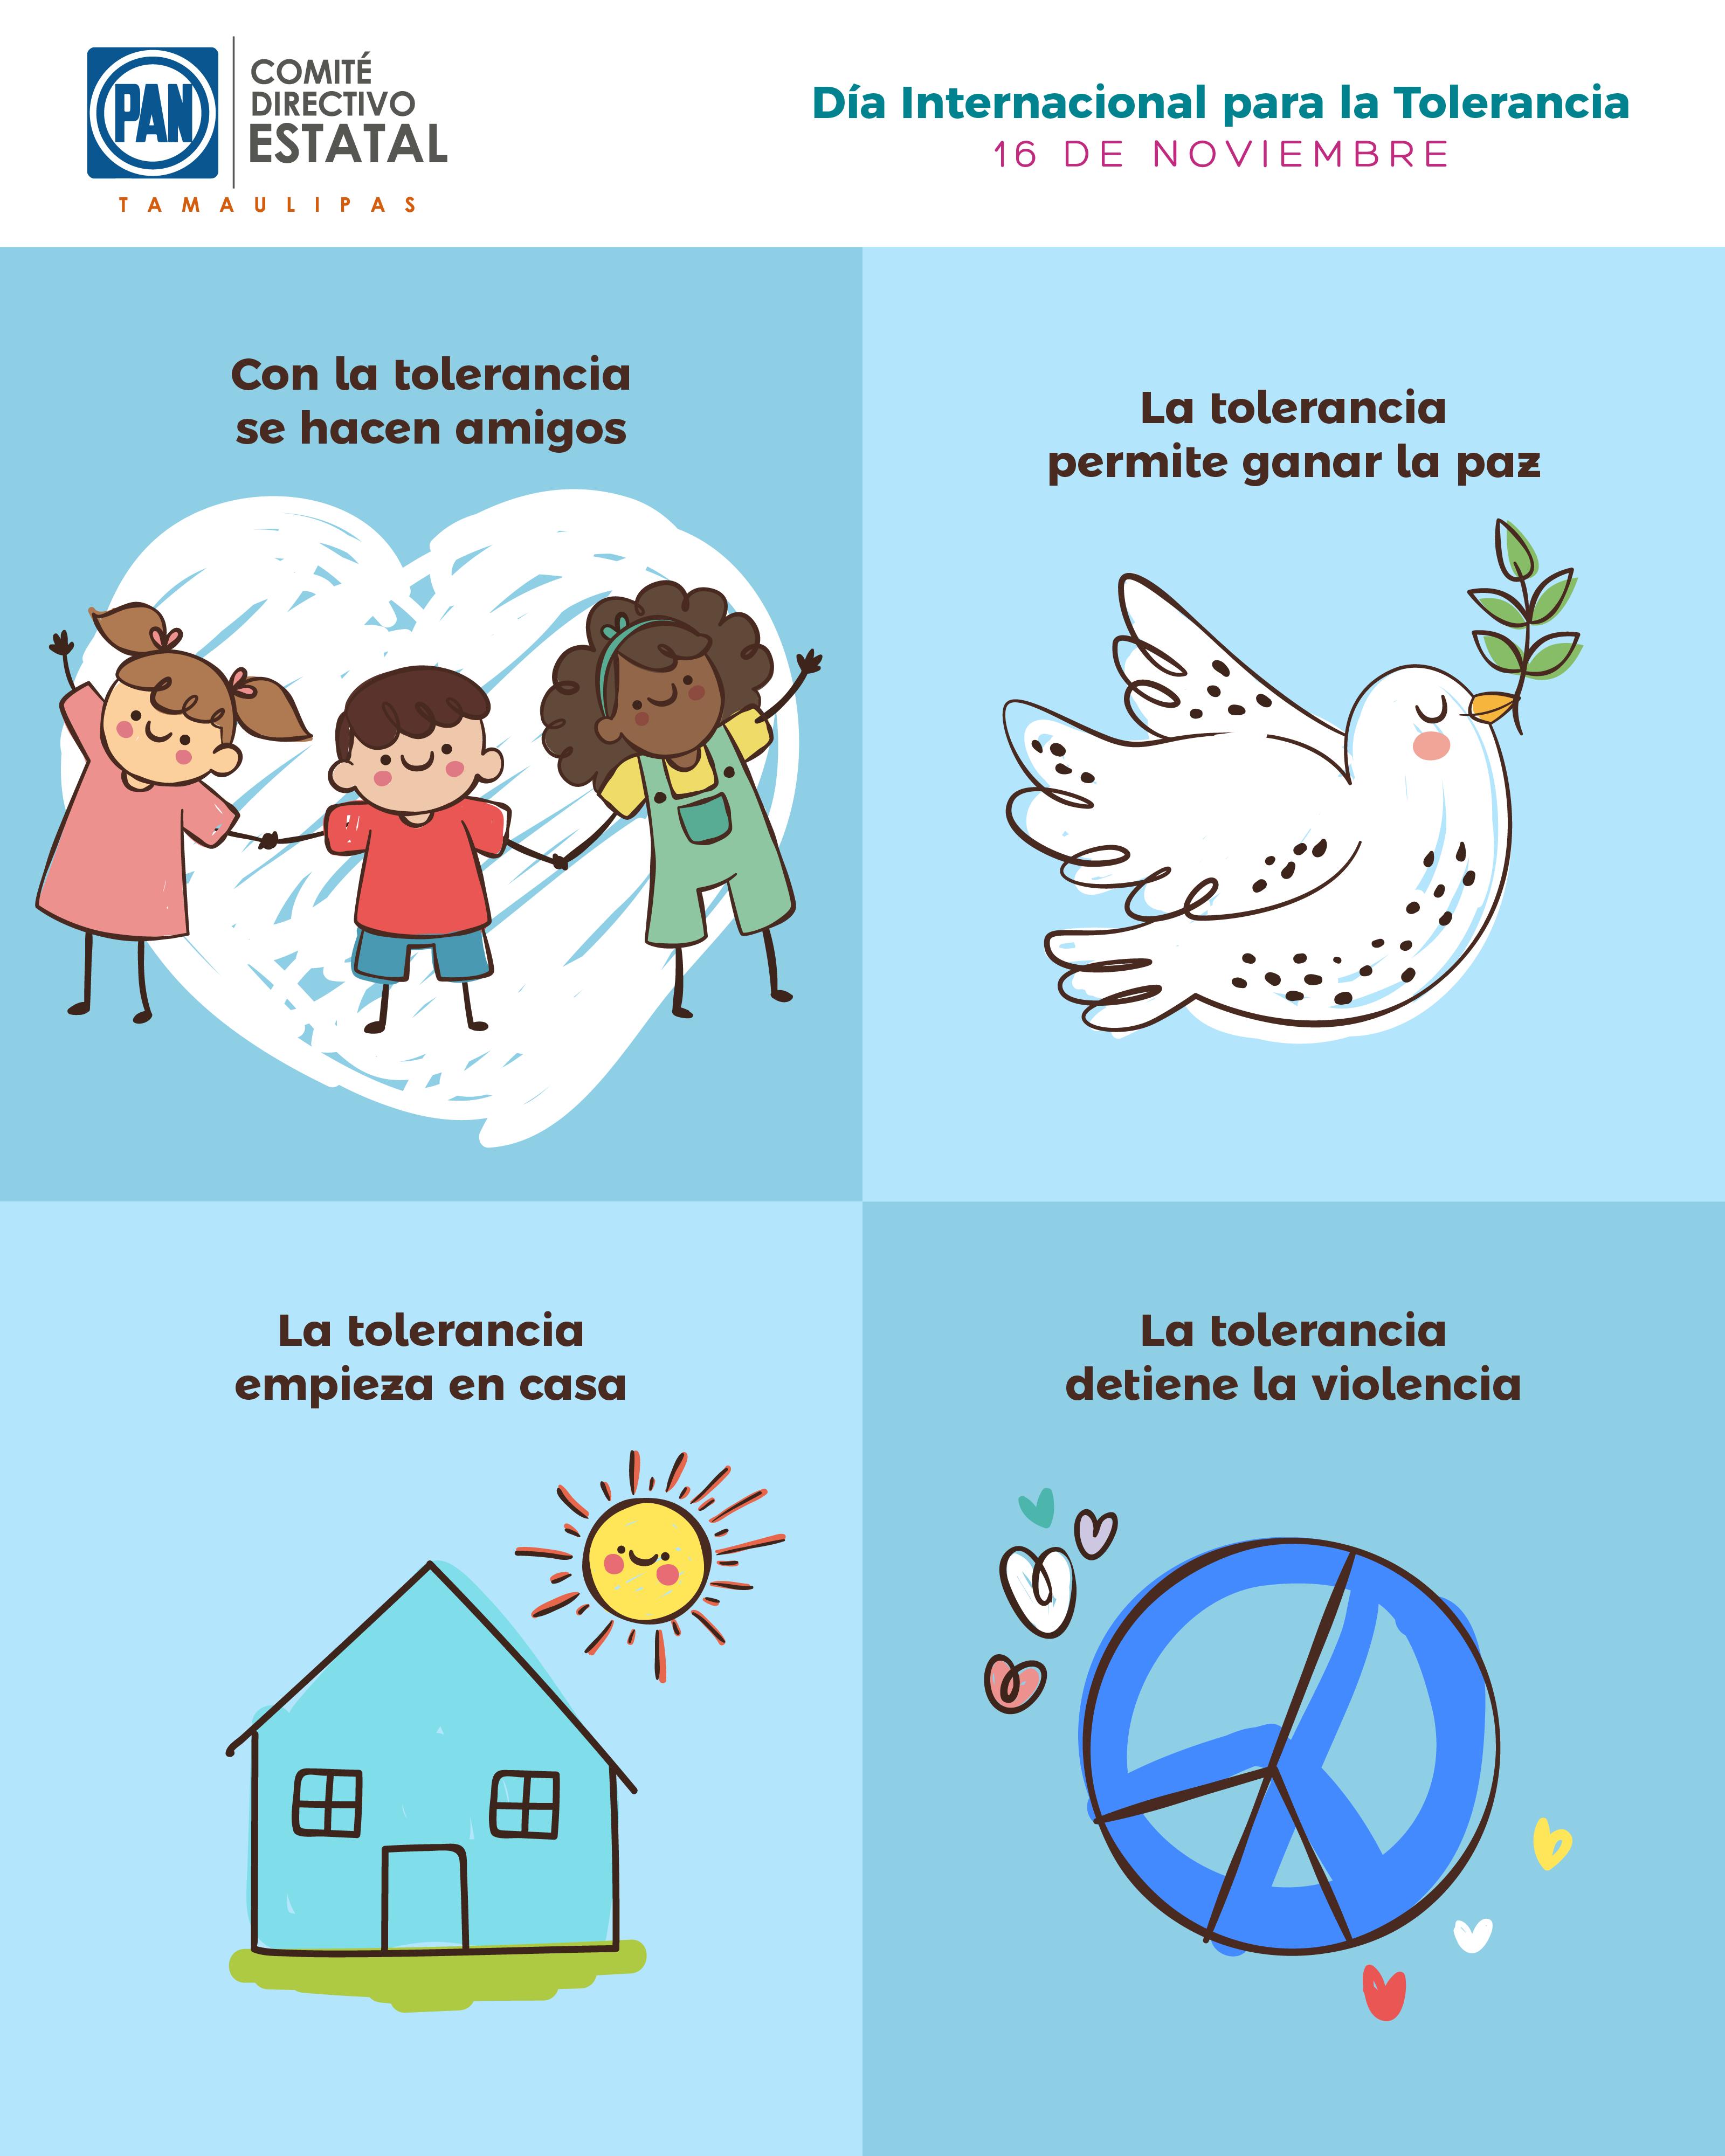 Dia Internacional Para La Tolerancia Amor Paz Pantamaulipas Efemerides Accionnacional Hacer Amigos Dia Internacional De Infografia